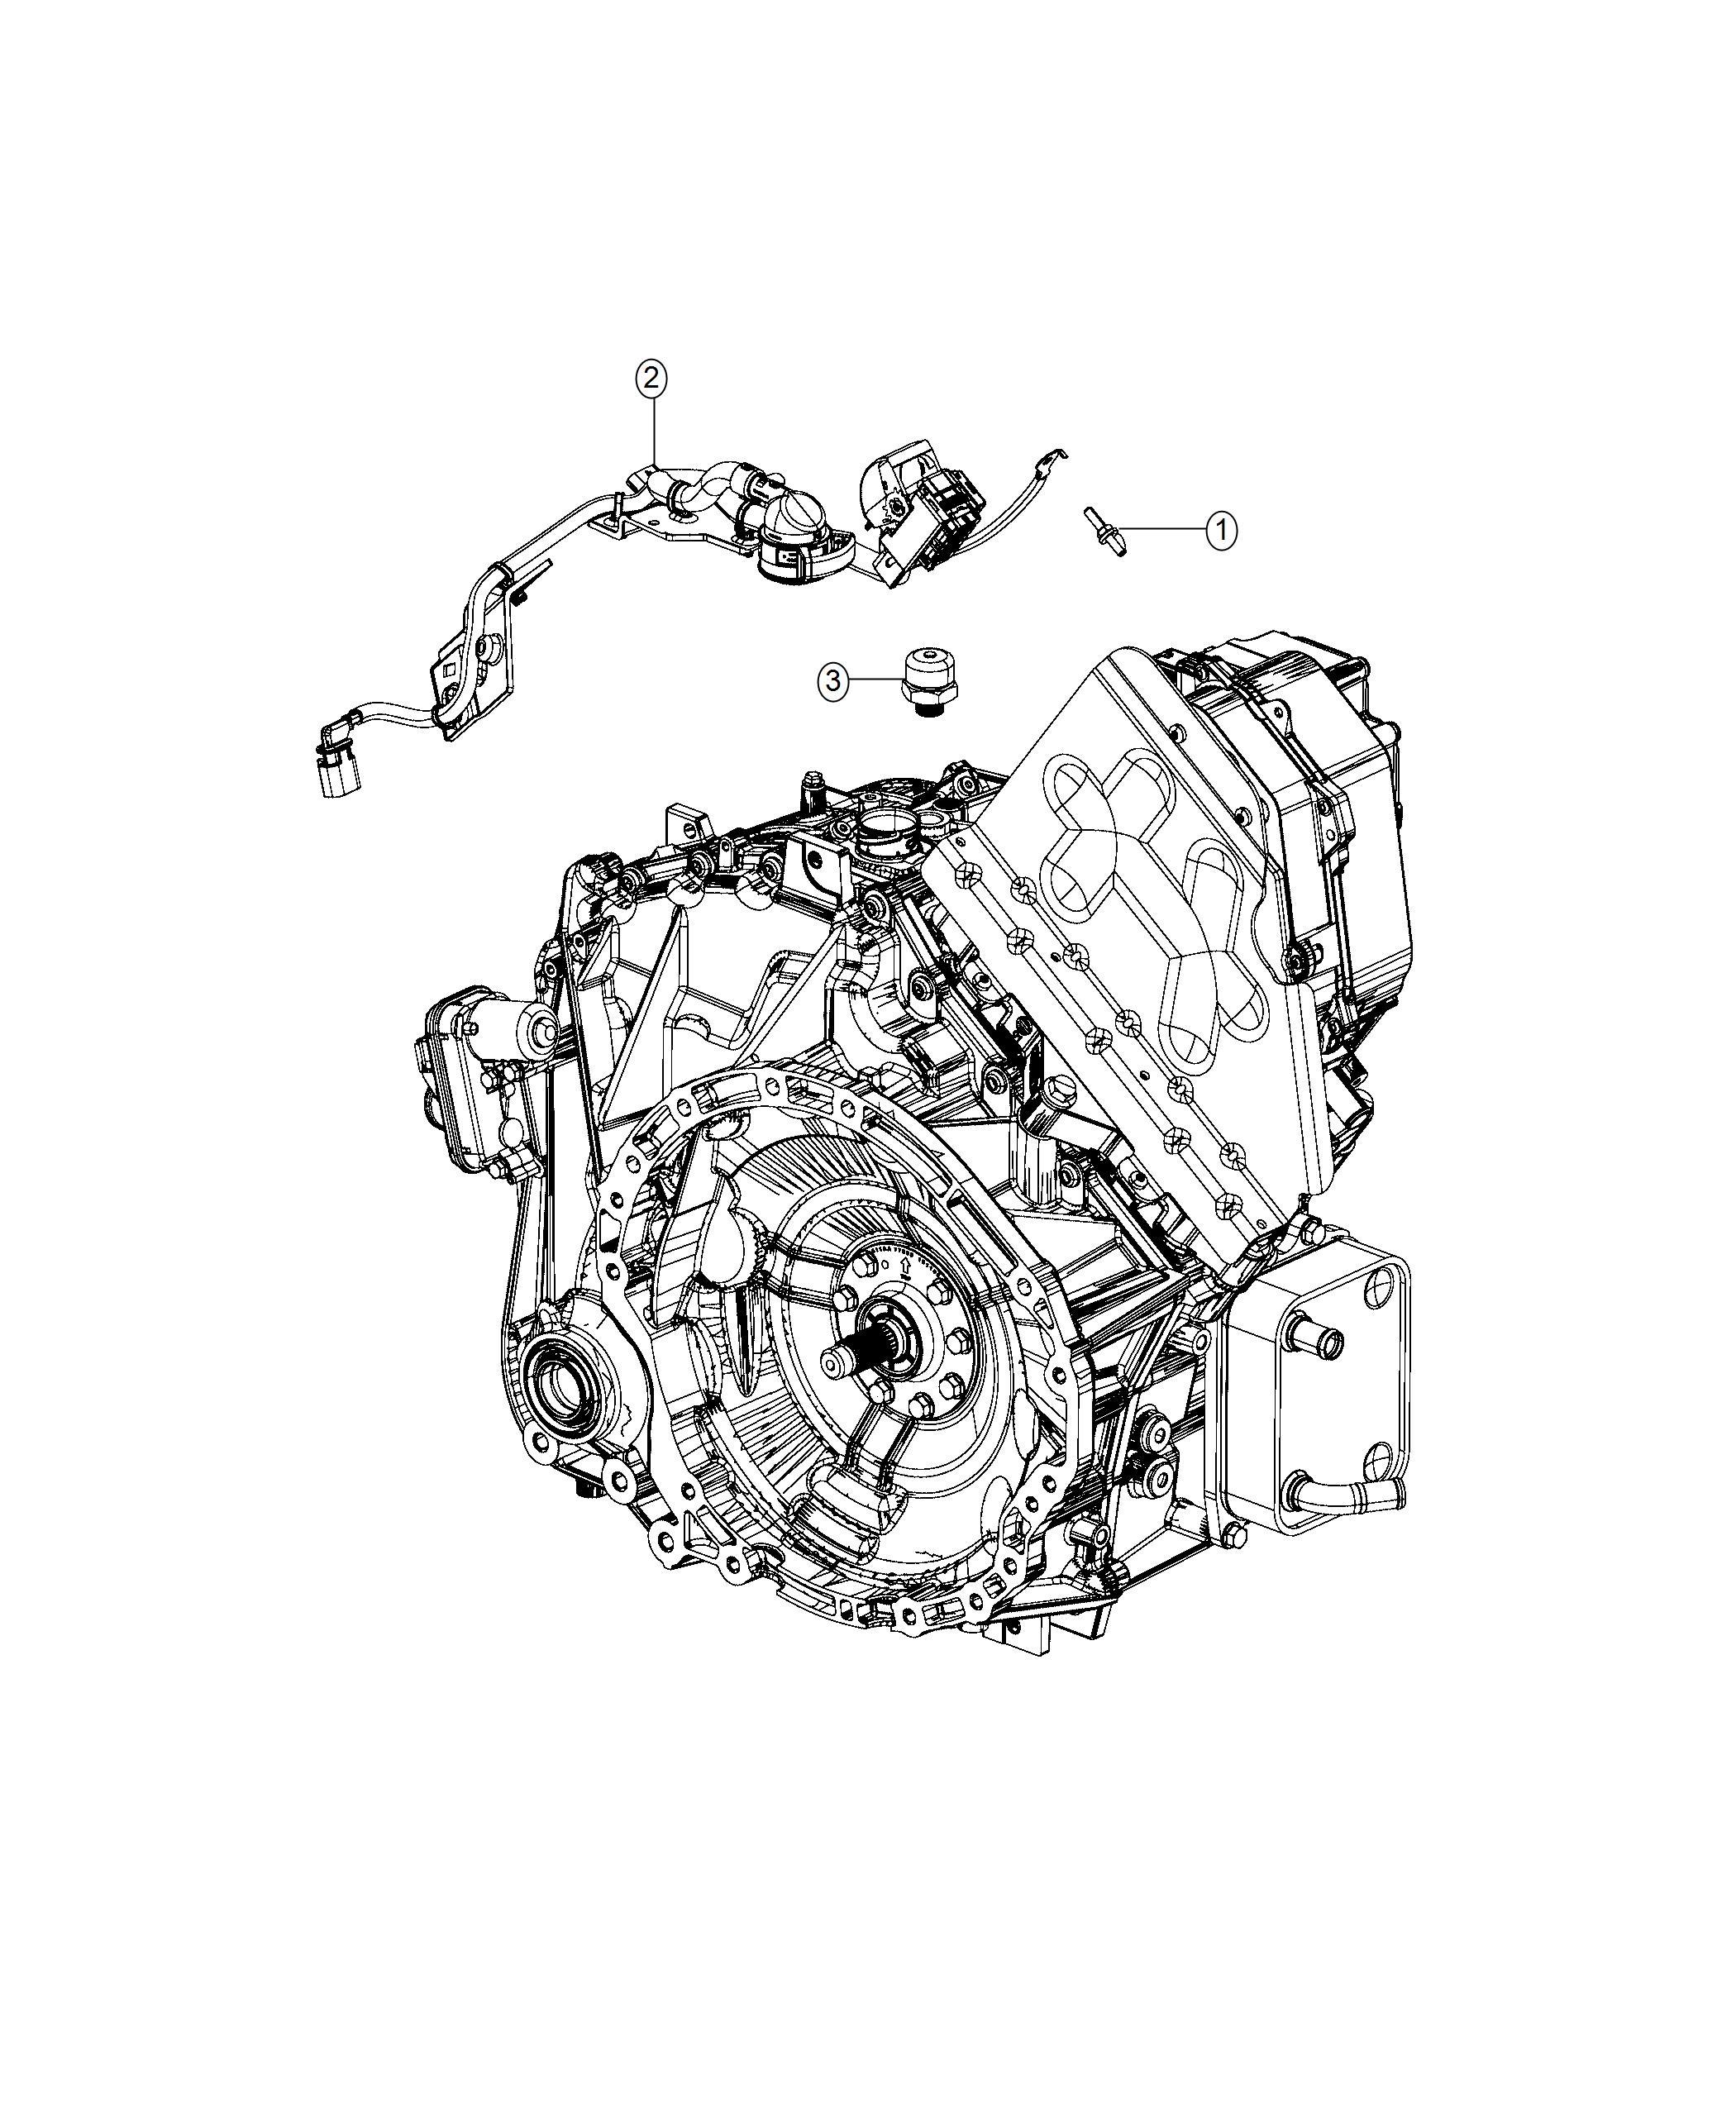 2017 Chrysler PACIFICA L HYBRID Wiring. Transmission